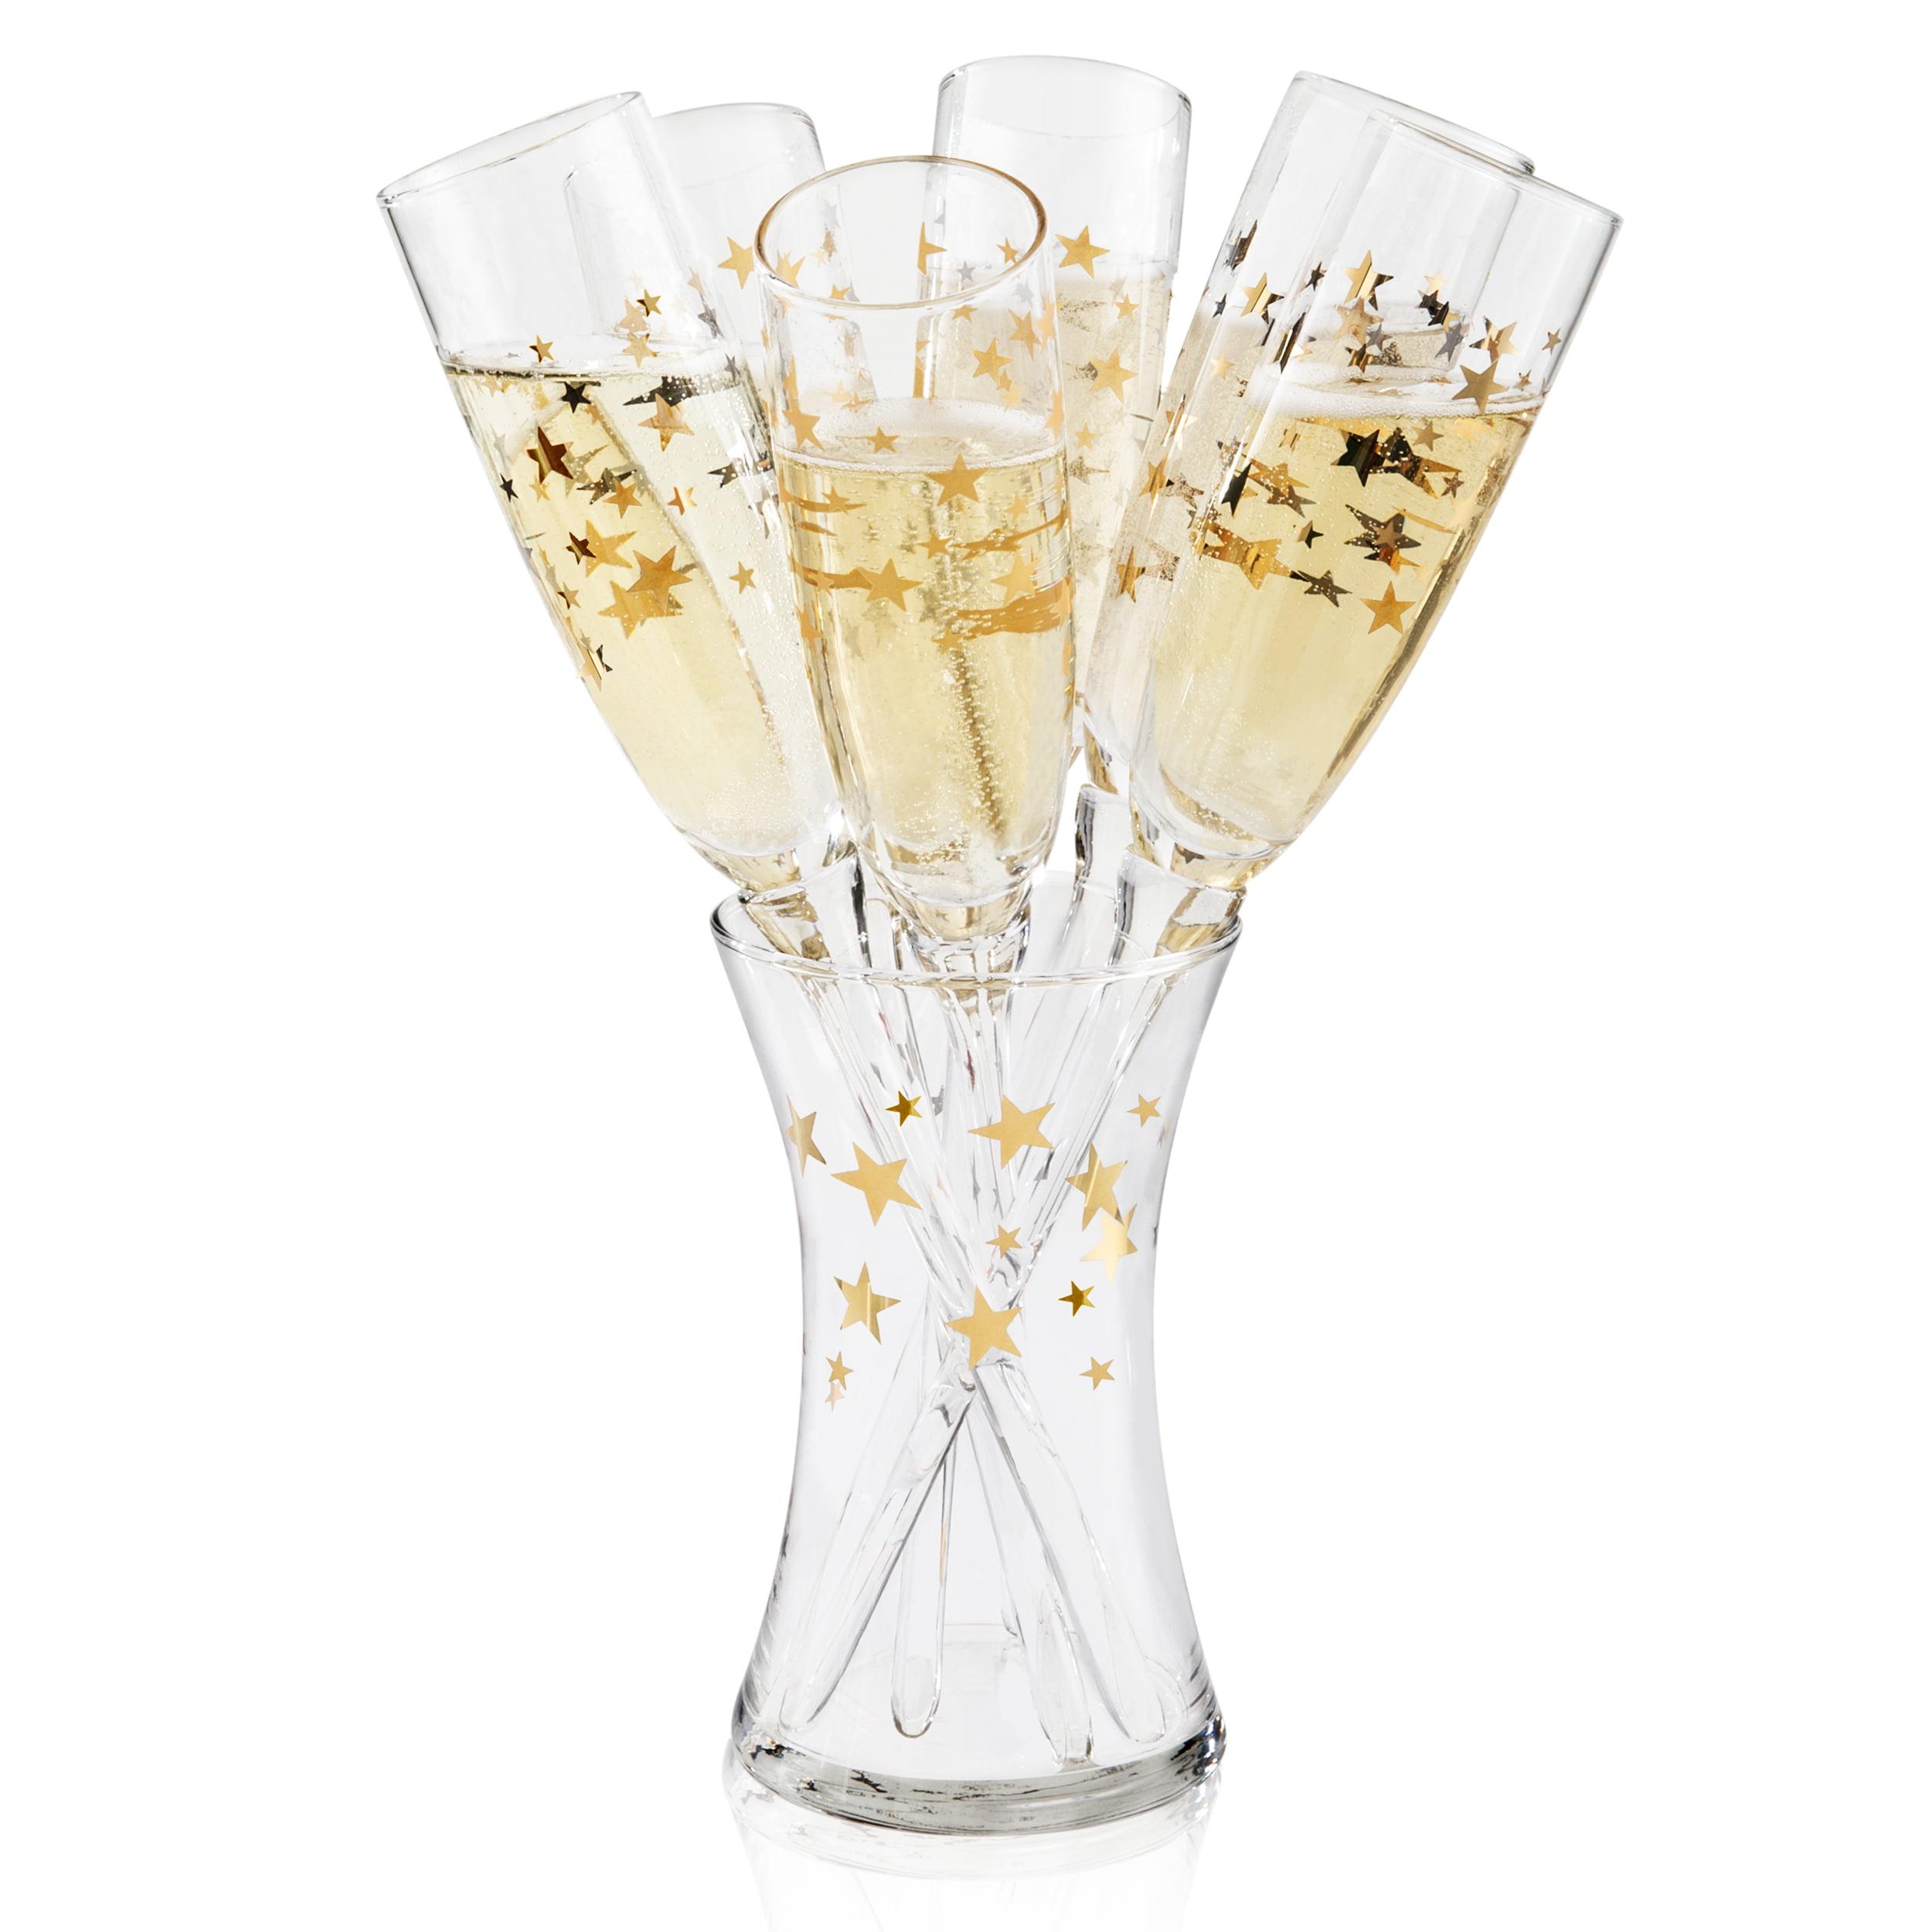 Artland Stars Floral Champagne Set, 7 Pieces